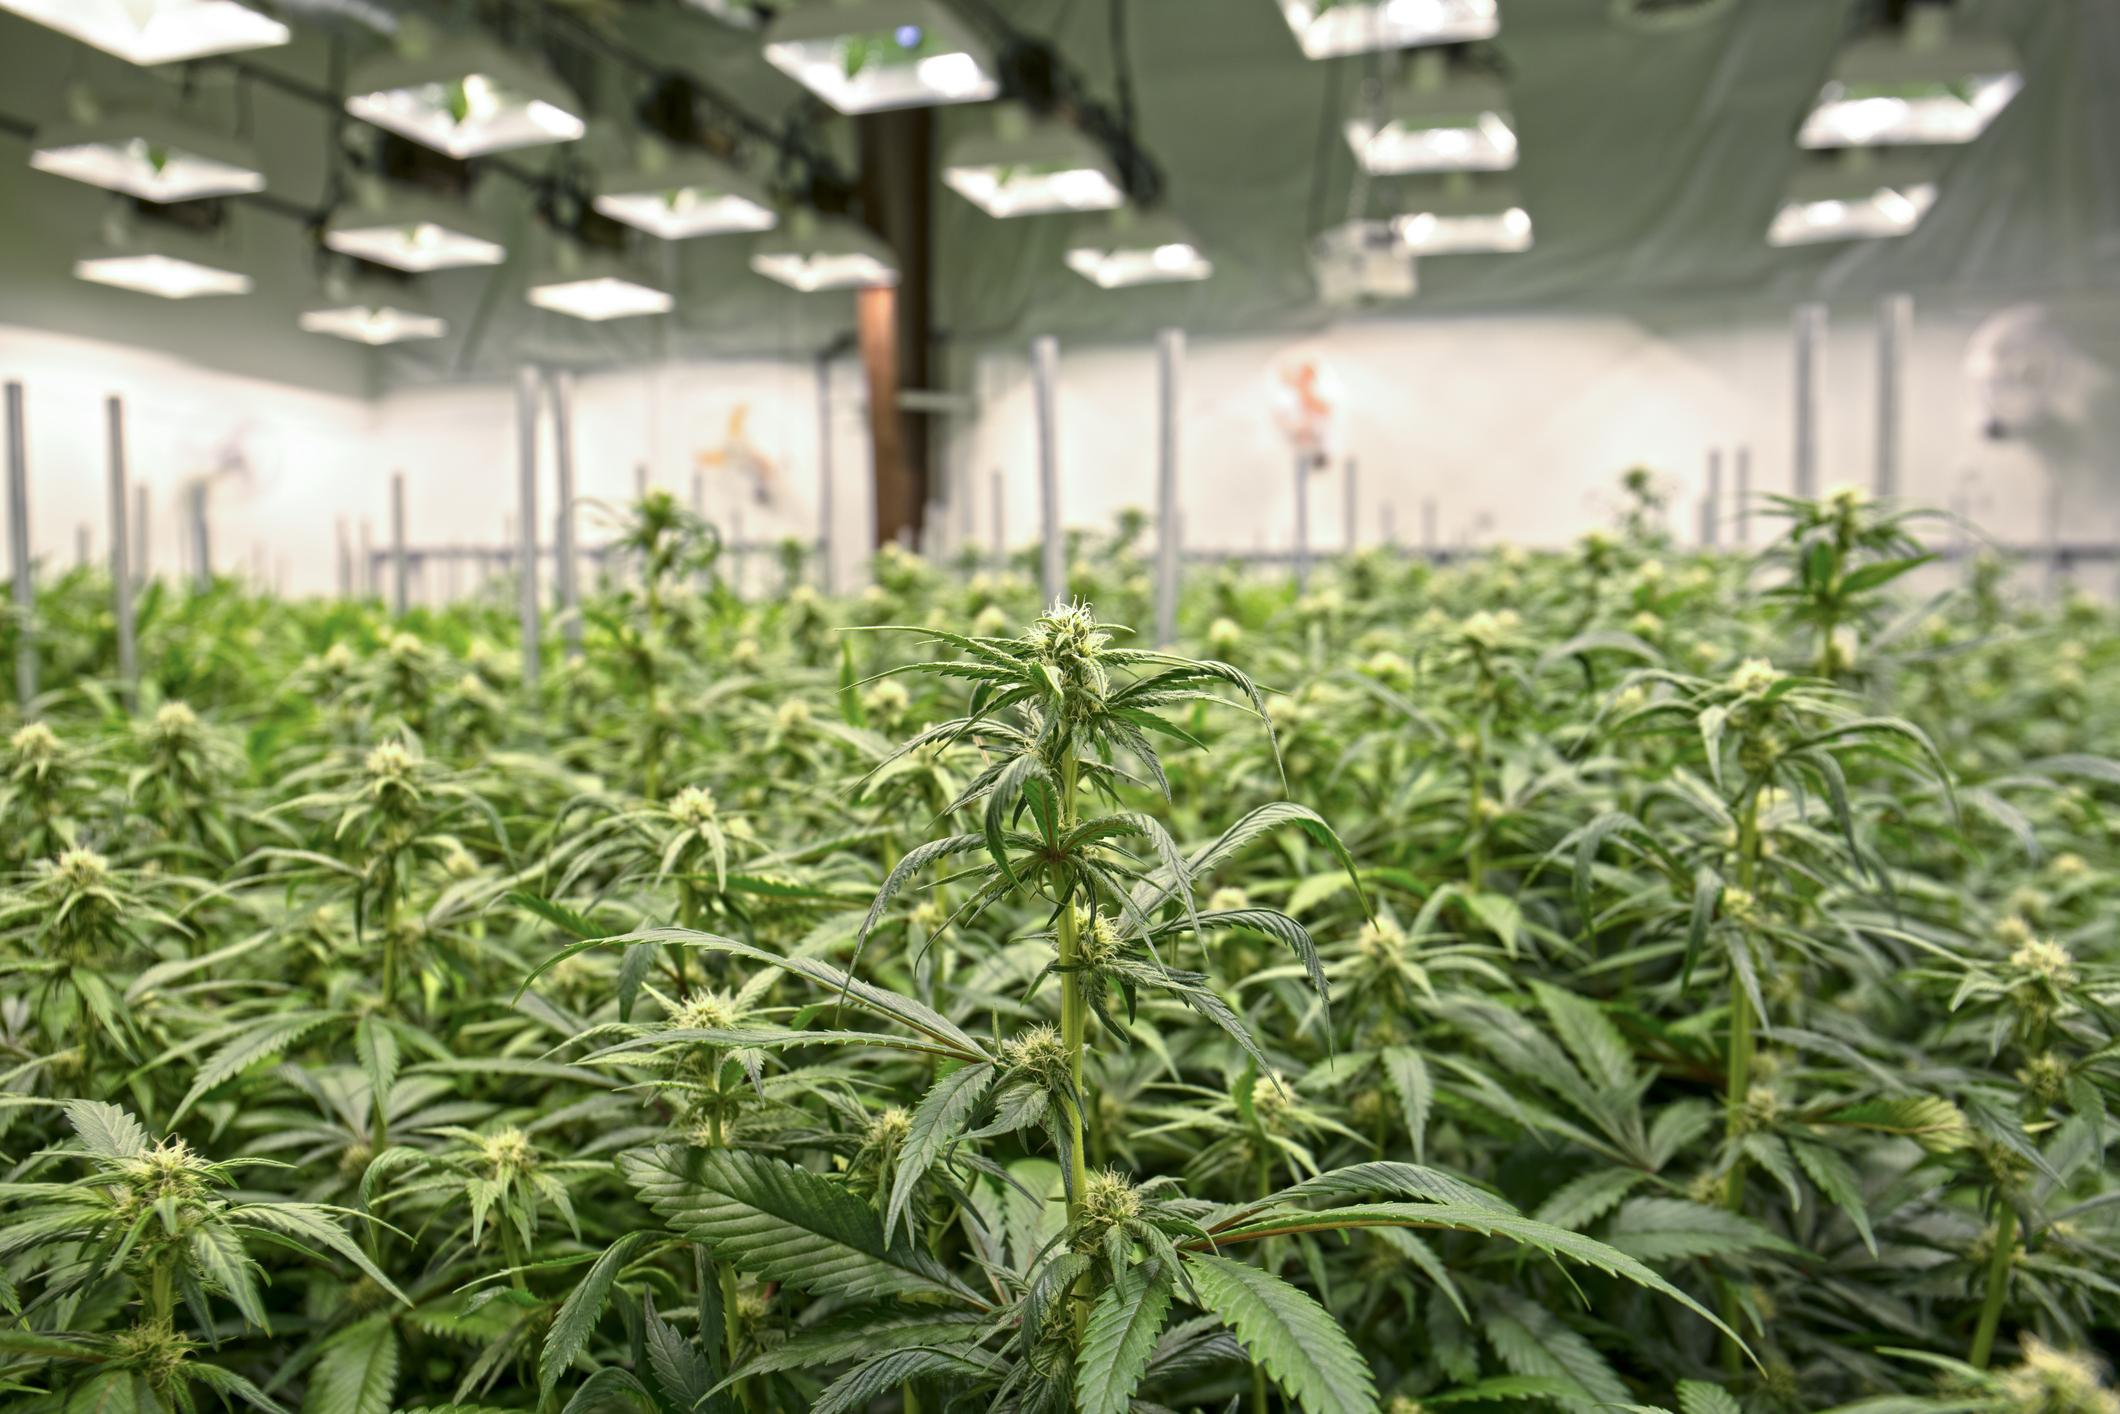 Indoor production facility with rows of marijuana plants.